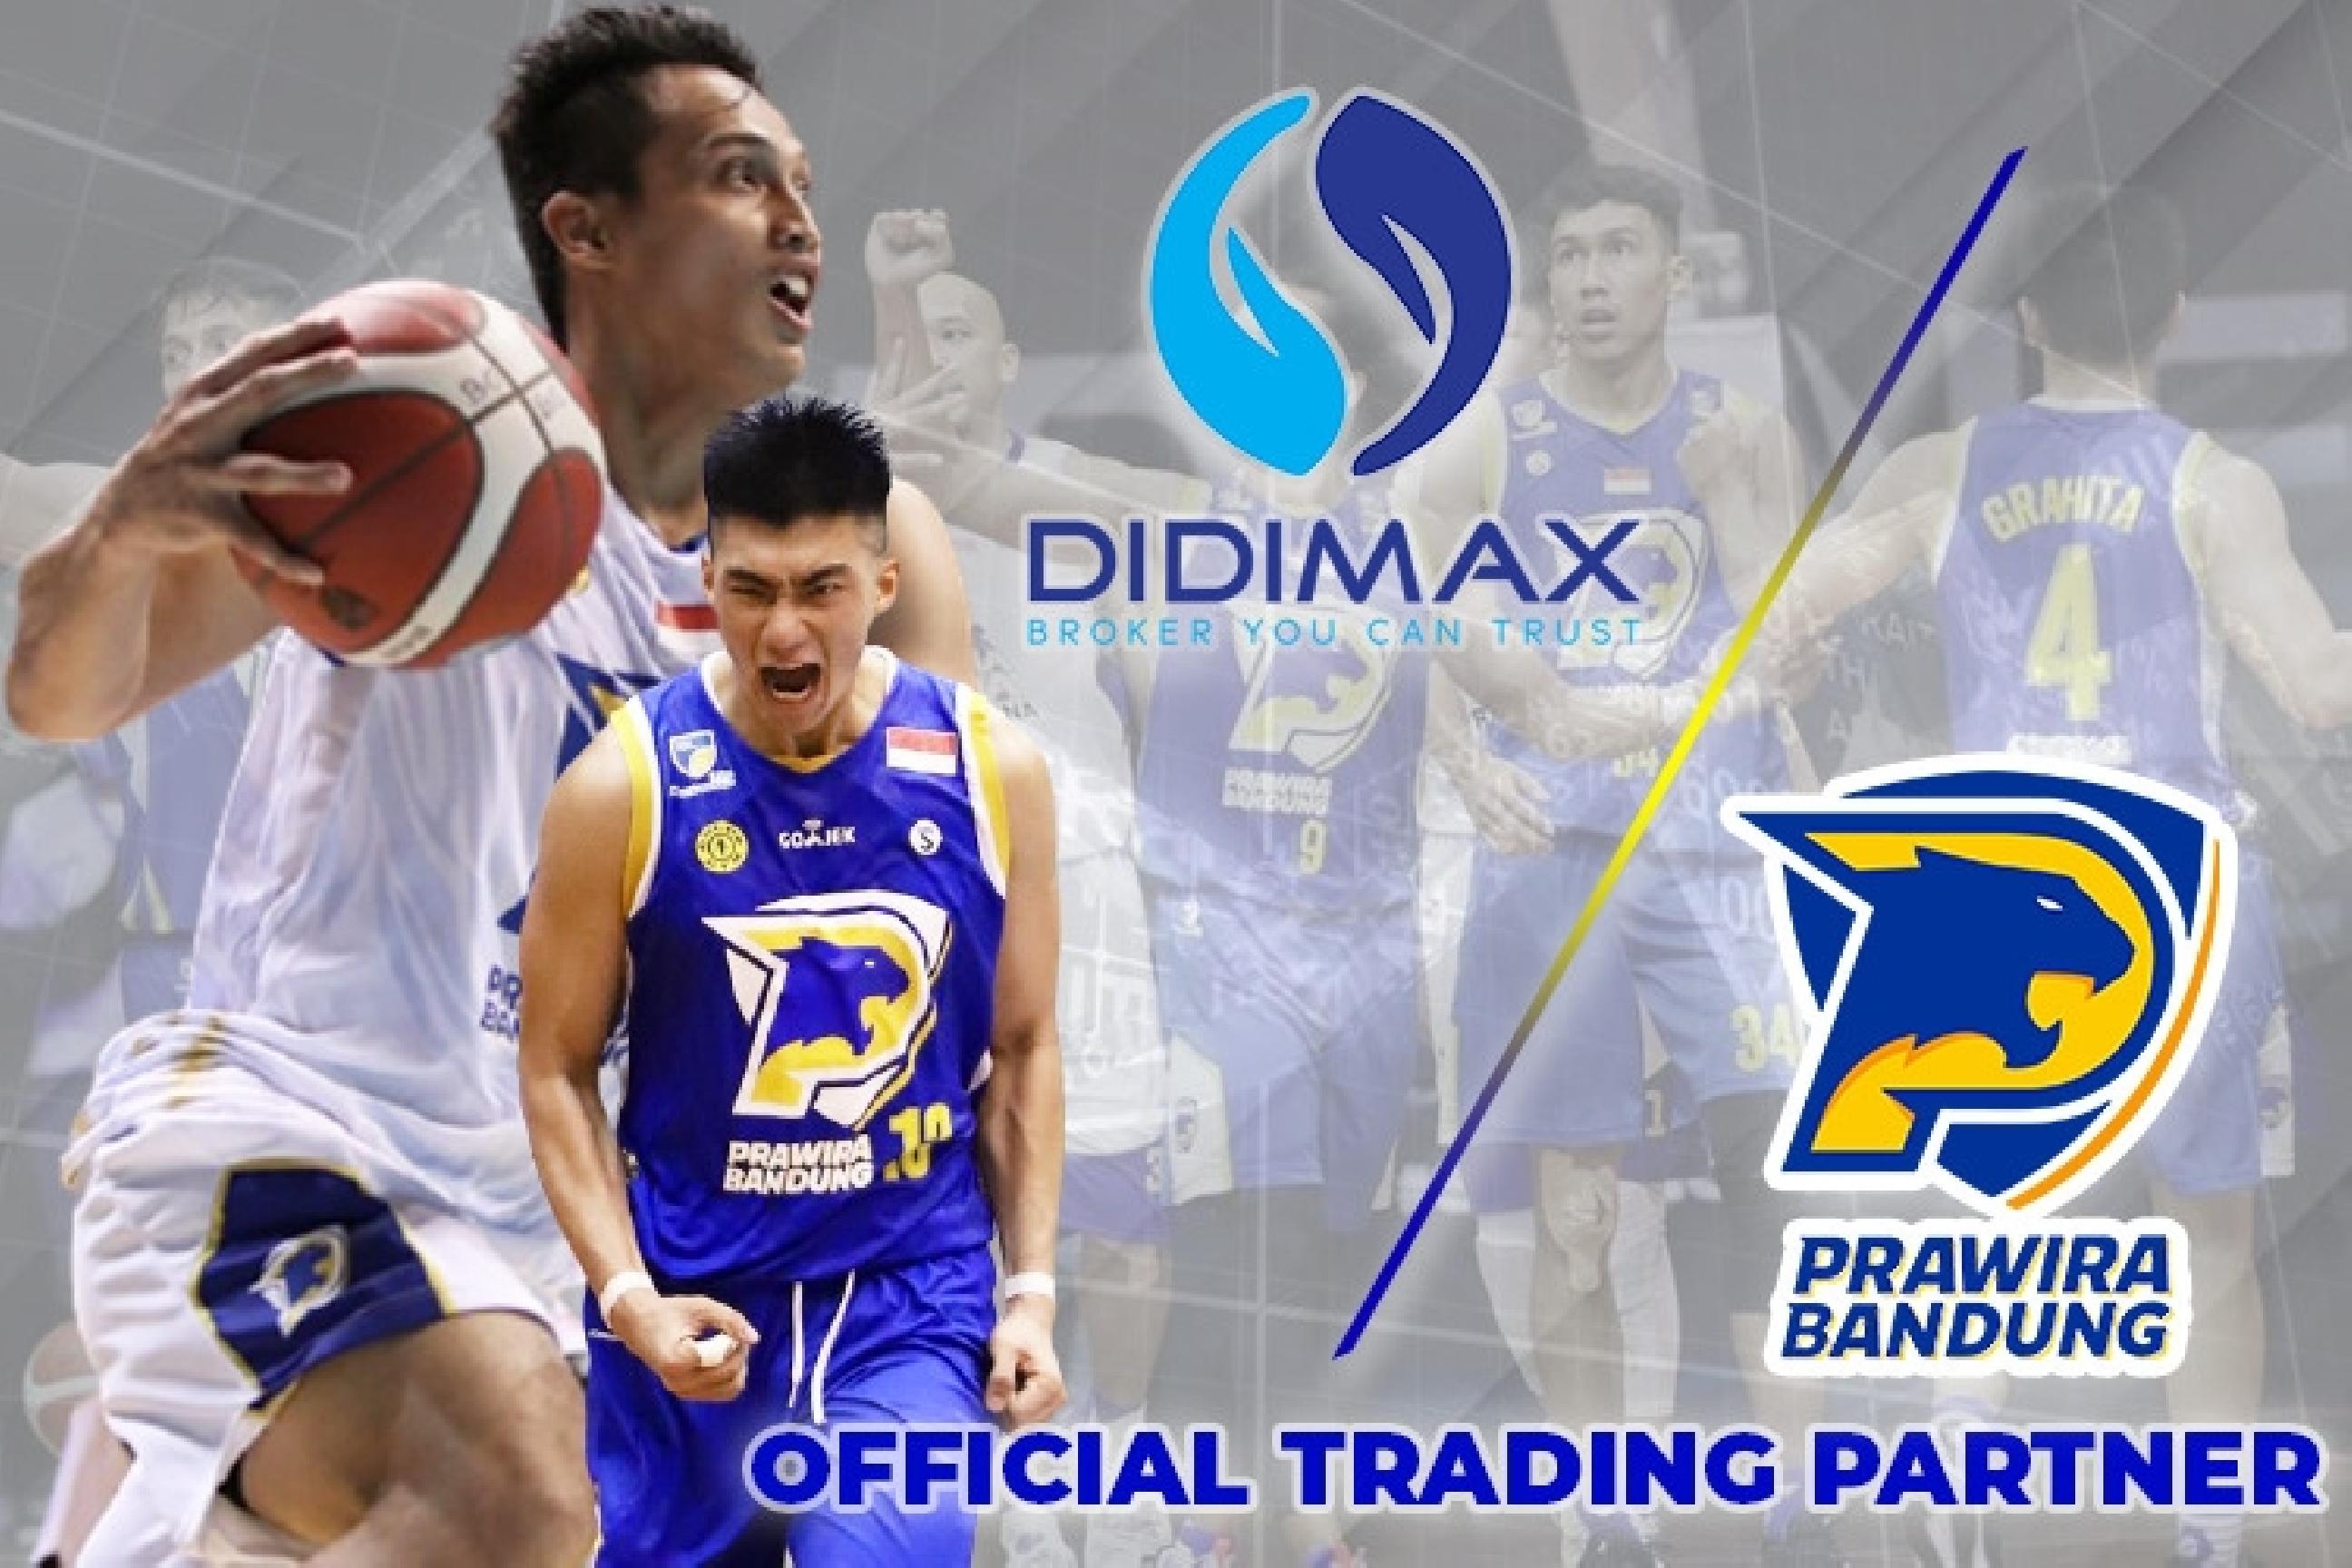 Didimax Berjangka sponsori tim bola basket Prawira Bandung di IBL 2021